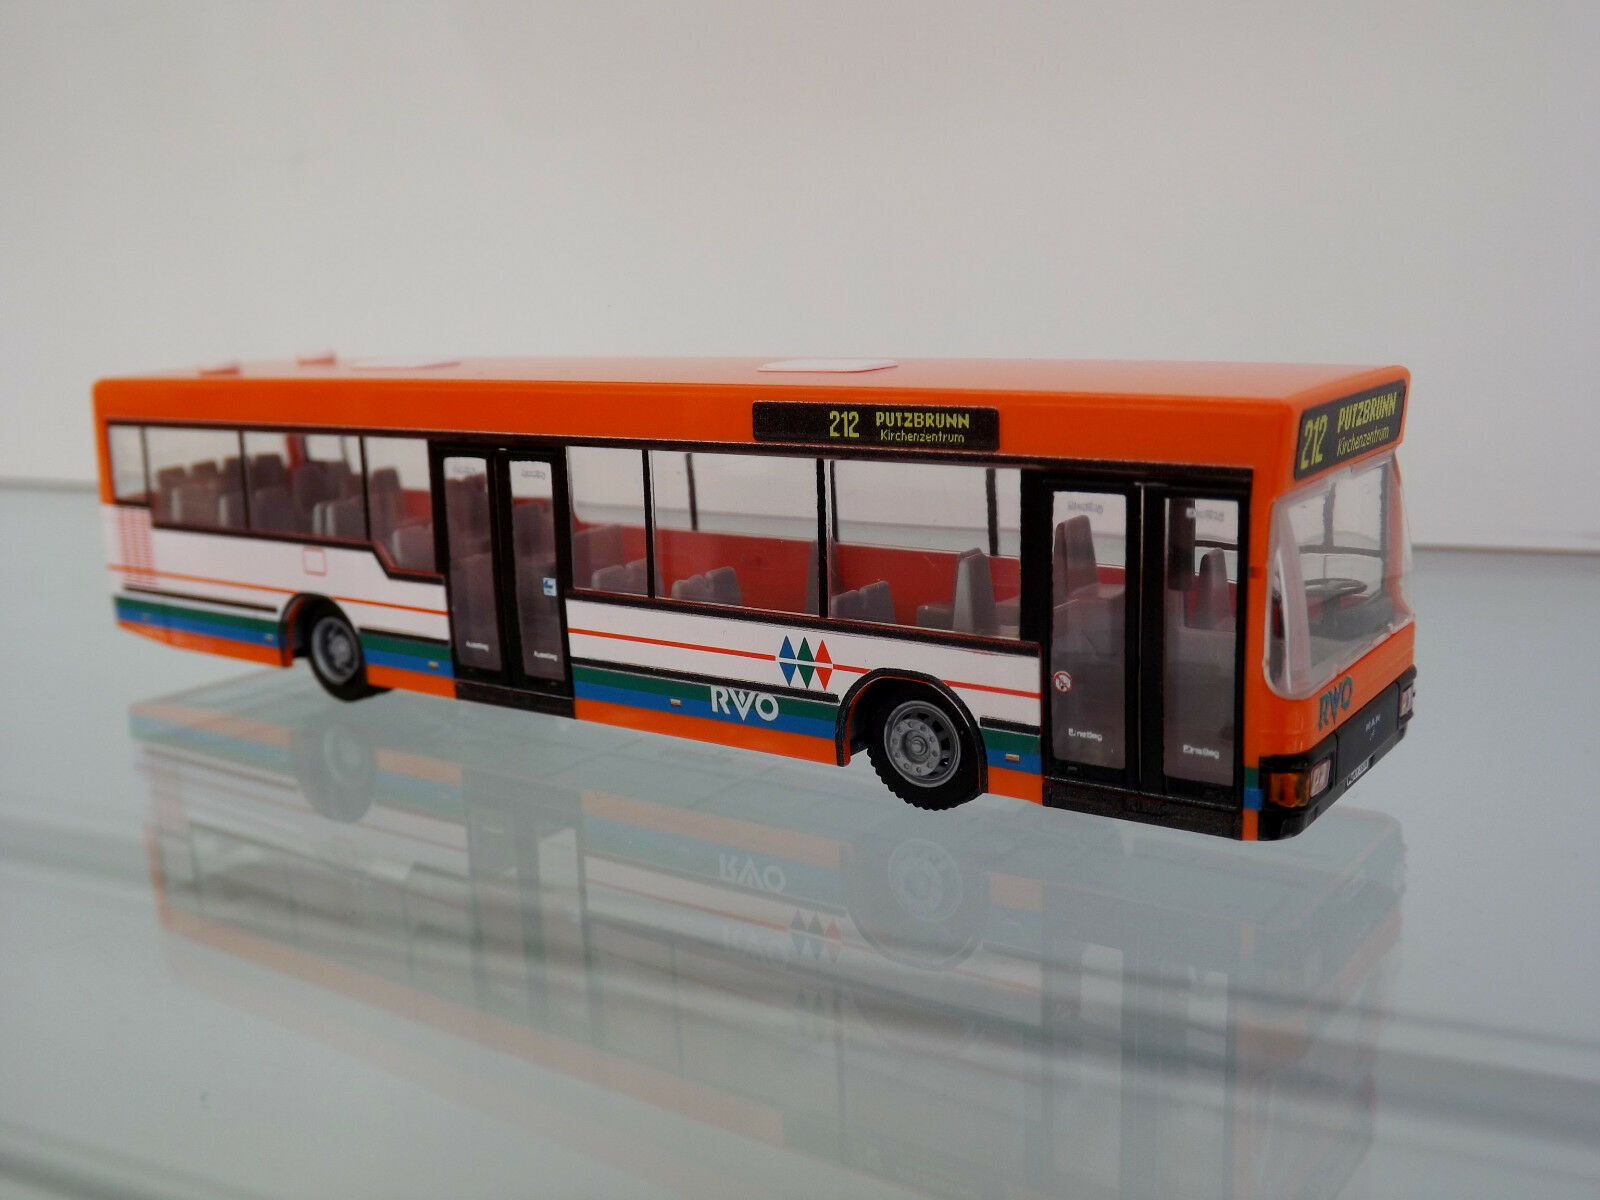 RIETZE 75018 - H0 1 87 Bus - MAN NL 202-2 RVO - NEU in OVP